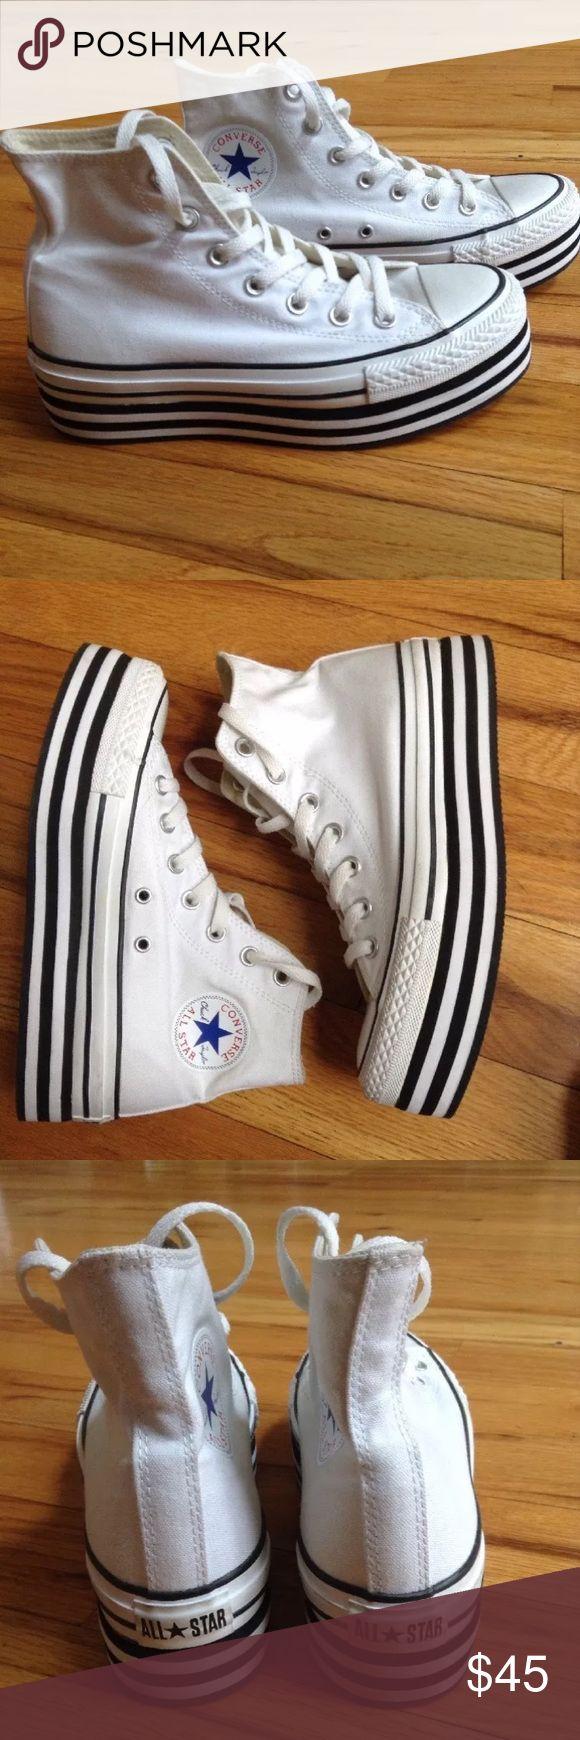 Platform converse chuck taylor shoes white W 7 M 5 White converse platform shoes. Size is men's 5, women's 7. Barely worn. Rare. Smoke free home. Converse Shoes Platforms